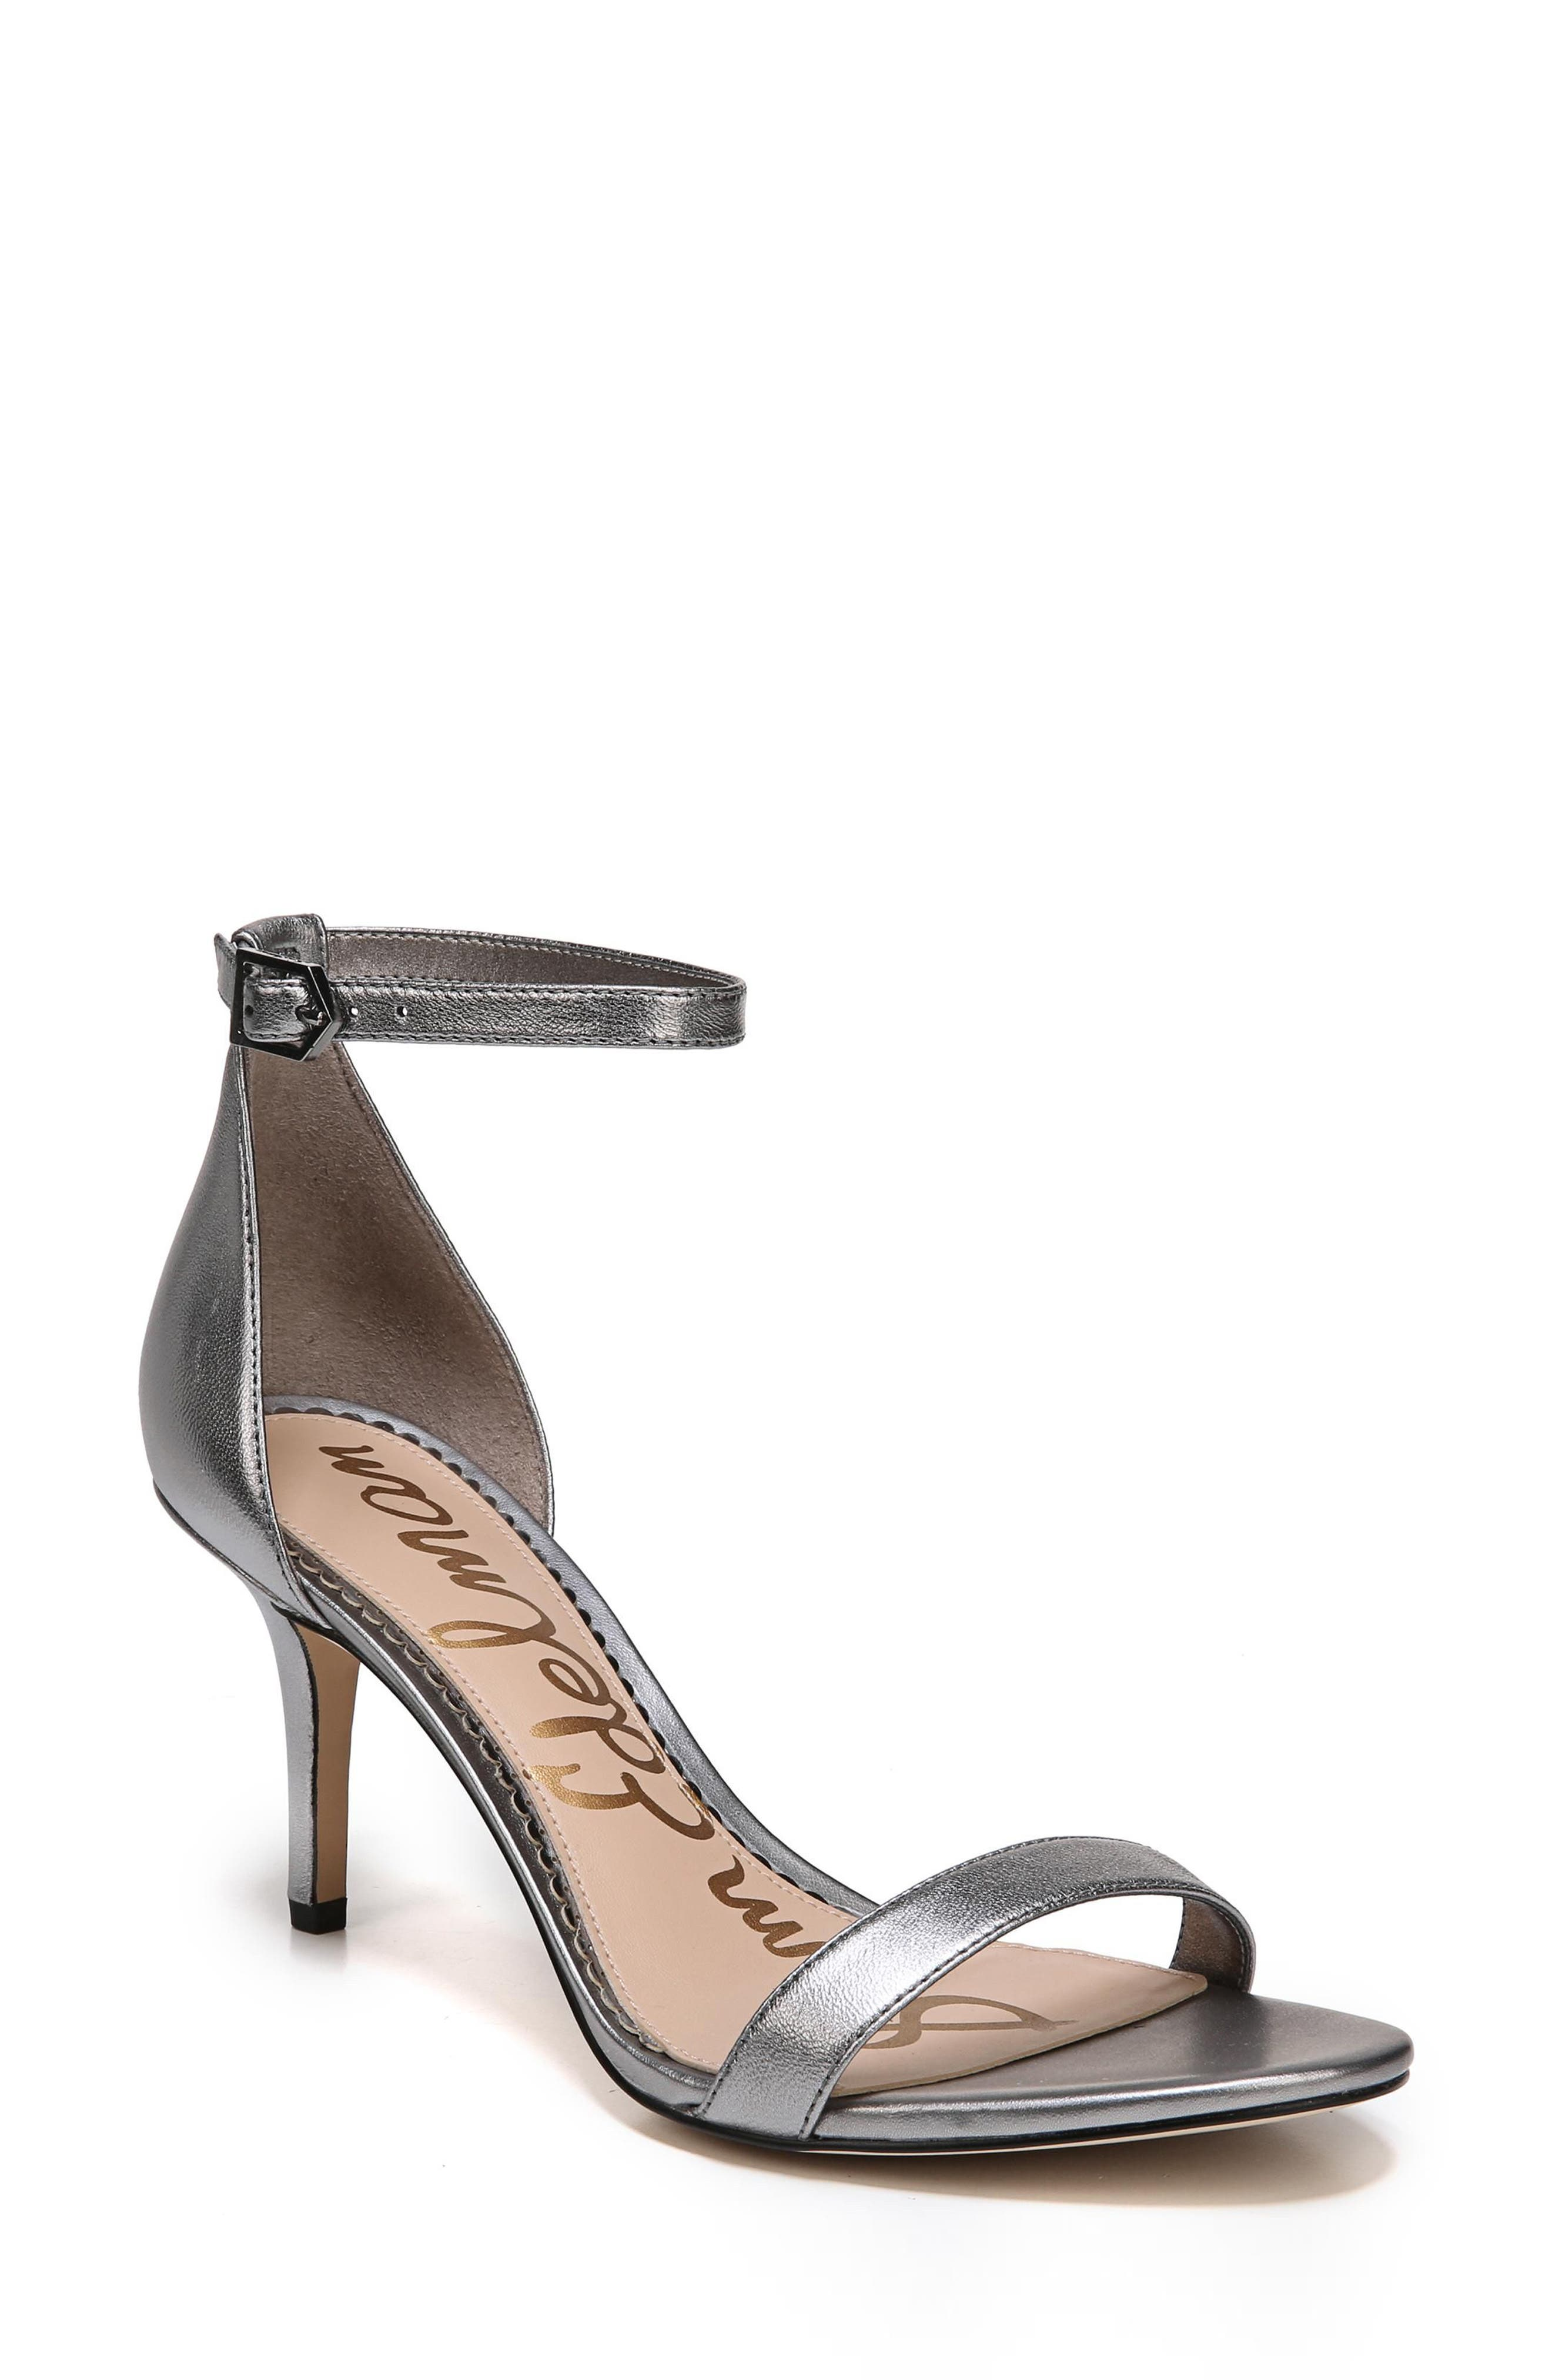 ,                             'Patti' Ankle Strap Sandal,                             Main thumbnail 25, color,                             040